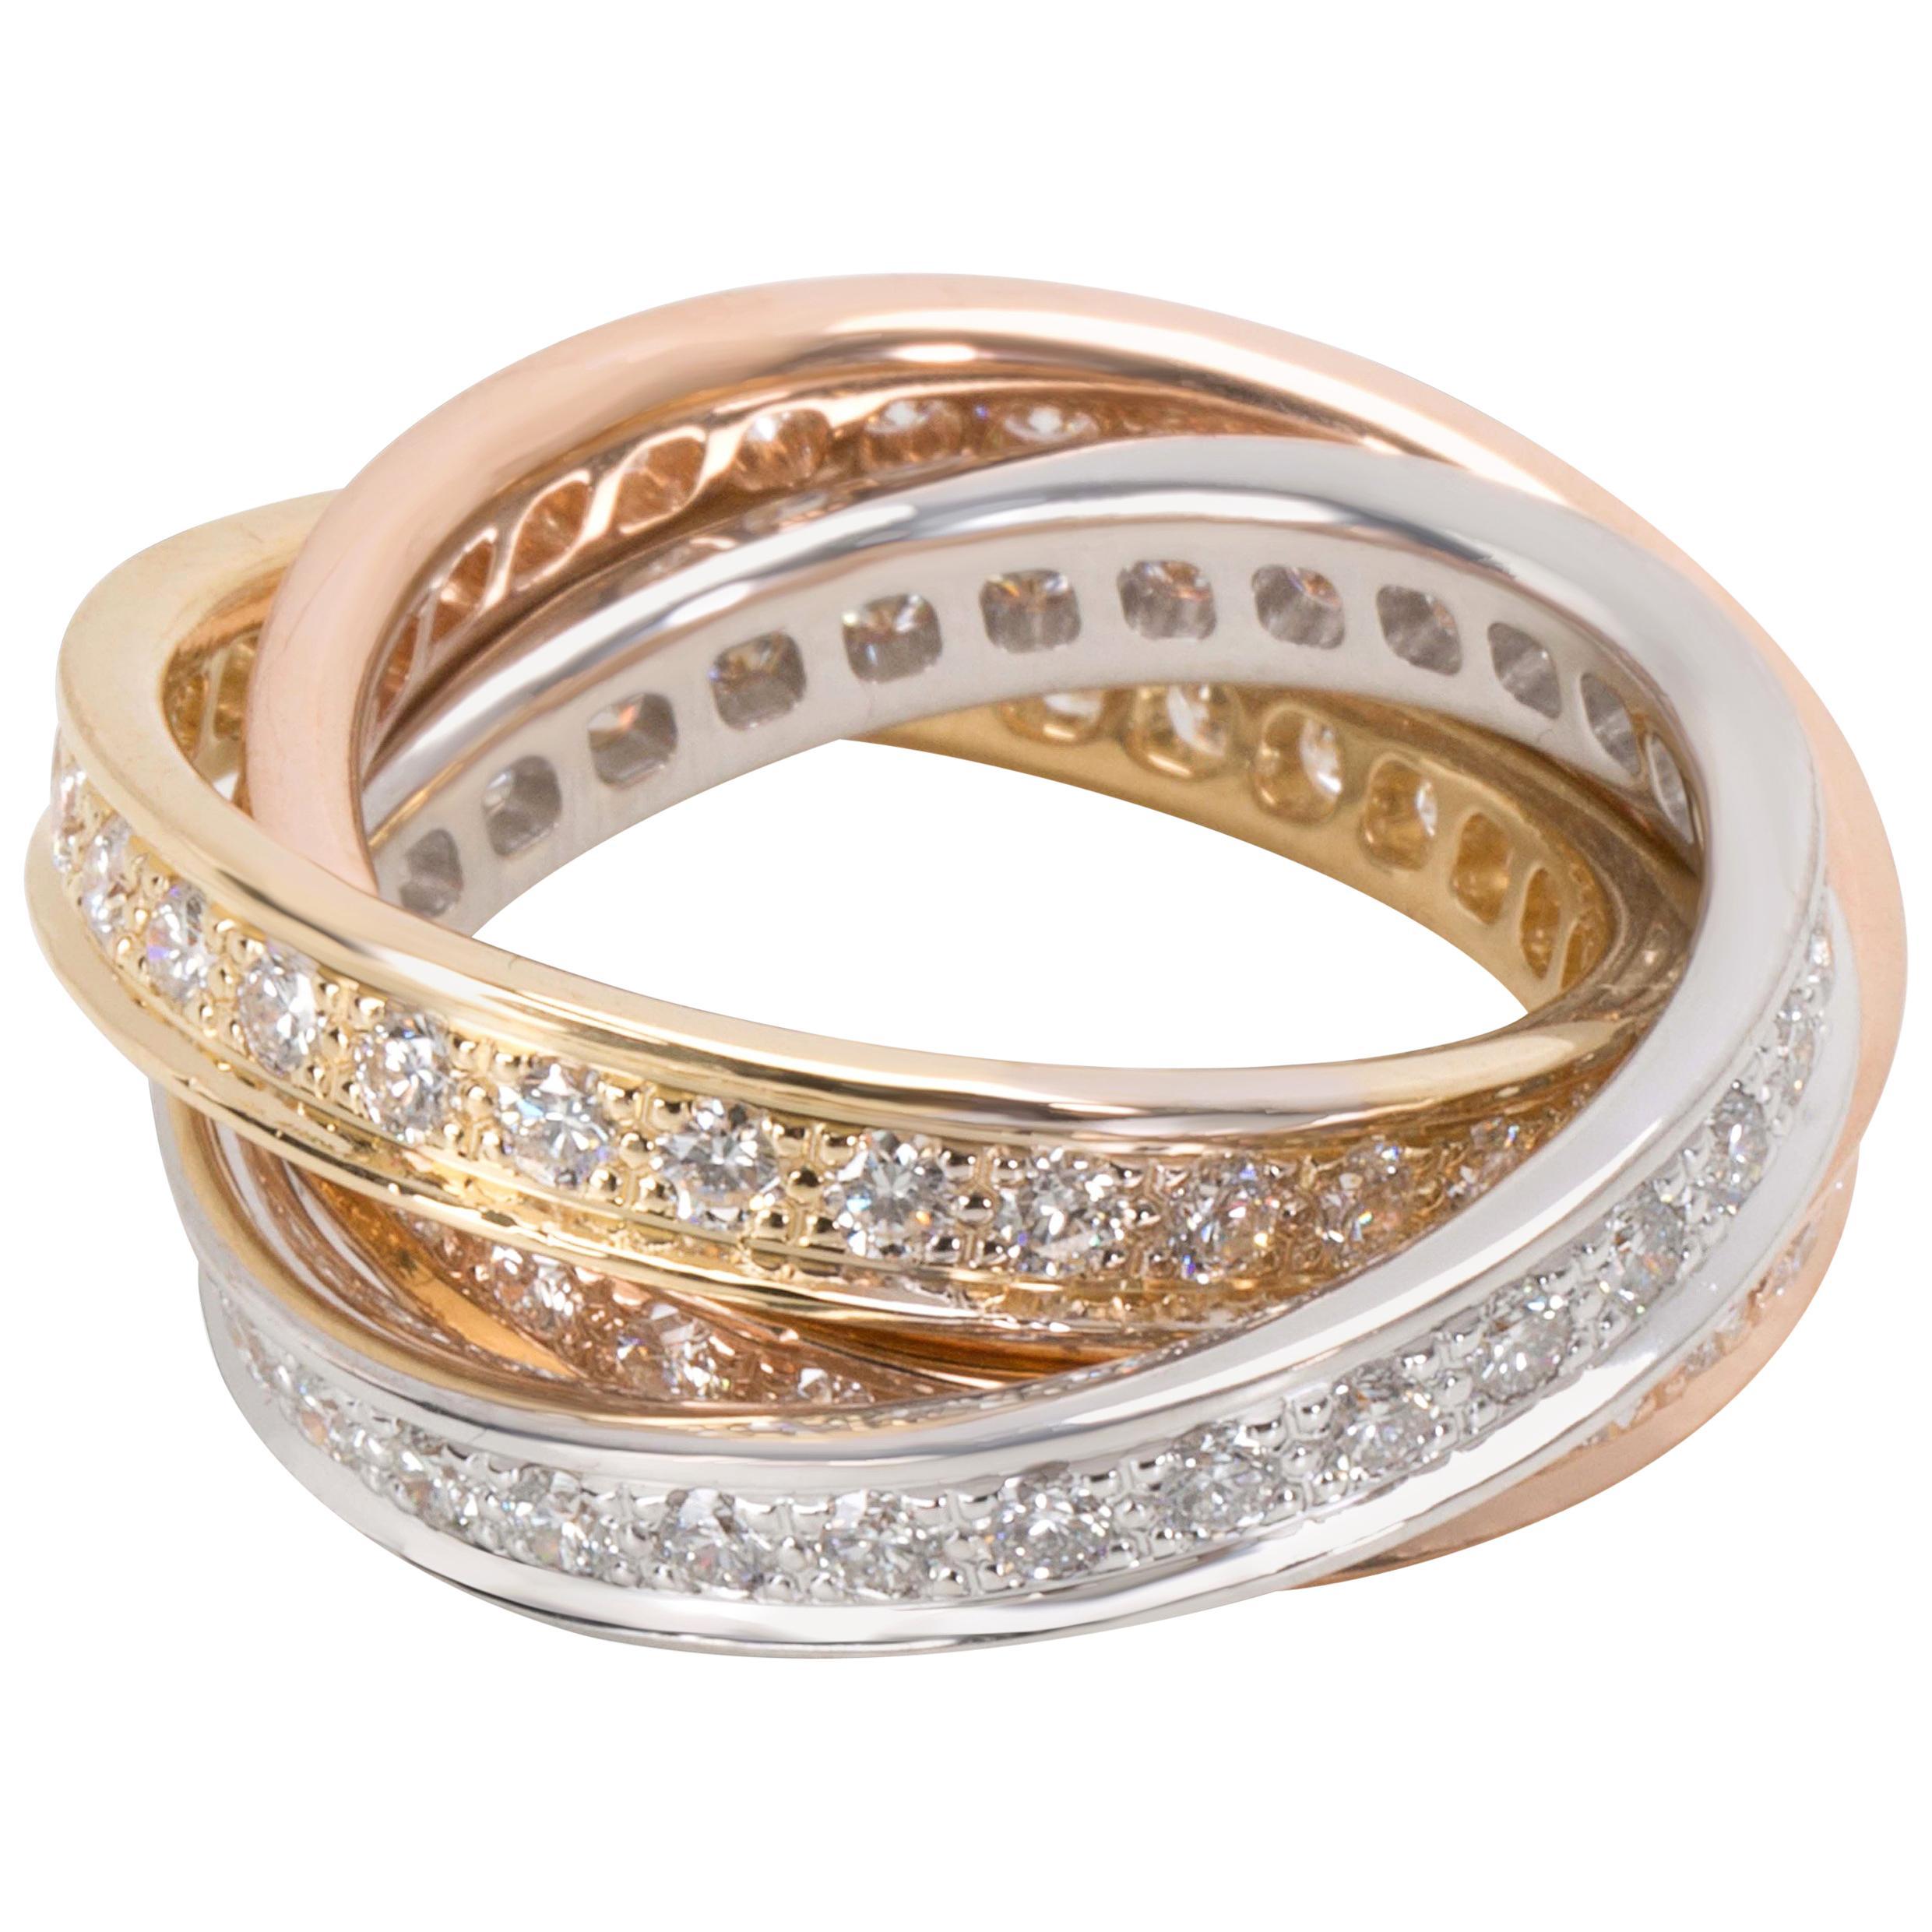 a076130121150 Cartier 3-Prong Diamond Tennis Bracelet in 18 Karat Yellow Gold 9.55 Carat  For Sale at 1stdibs